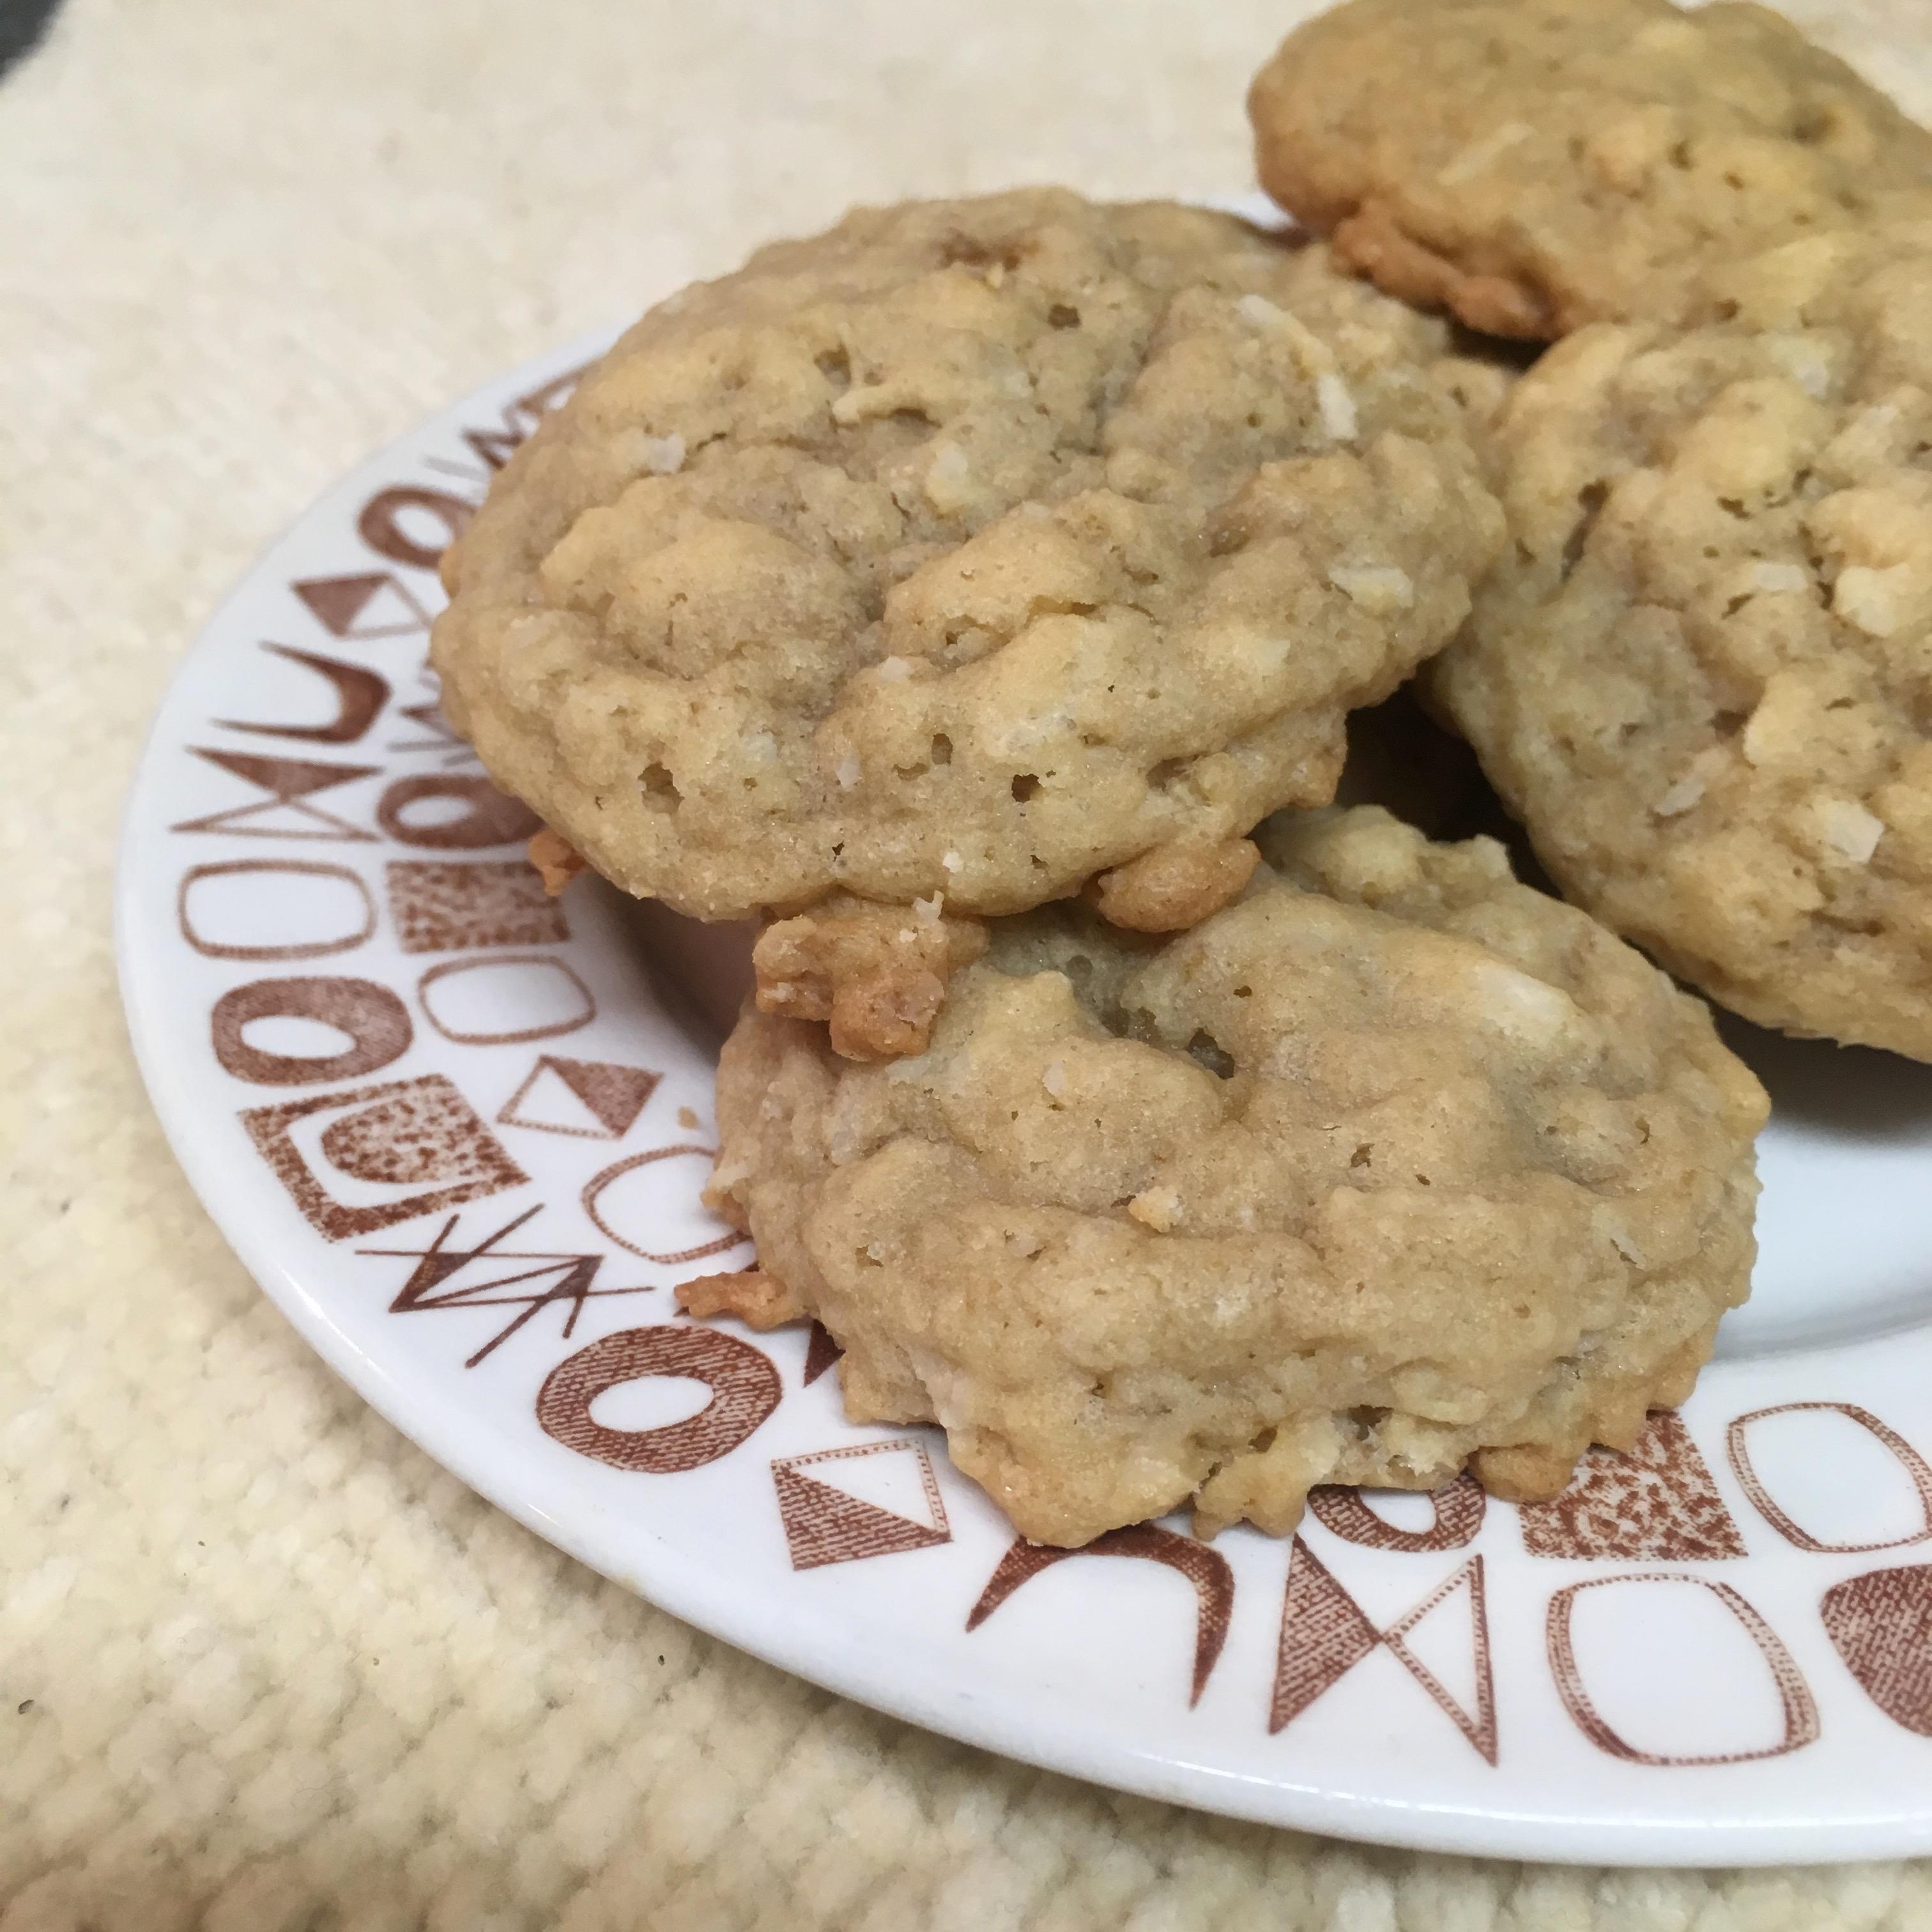 Grandmother's Oatmeal Coconut Cookies